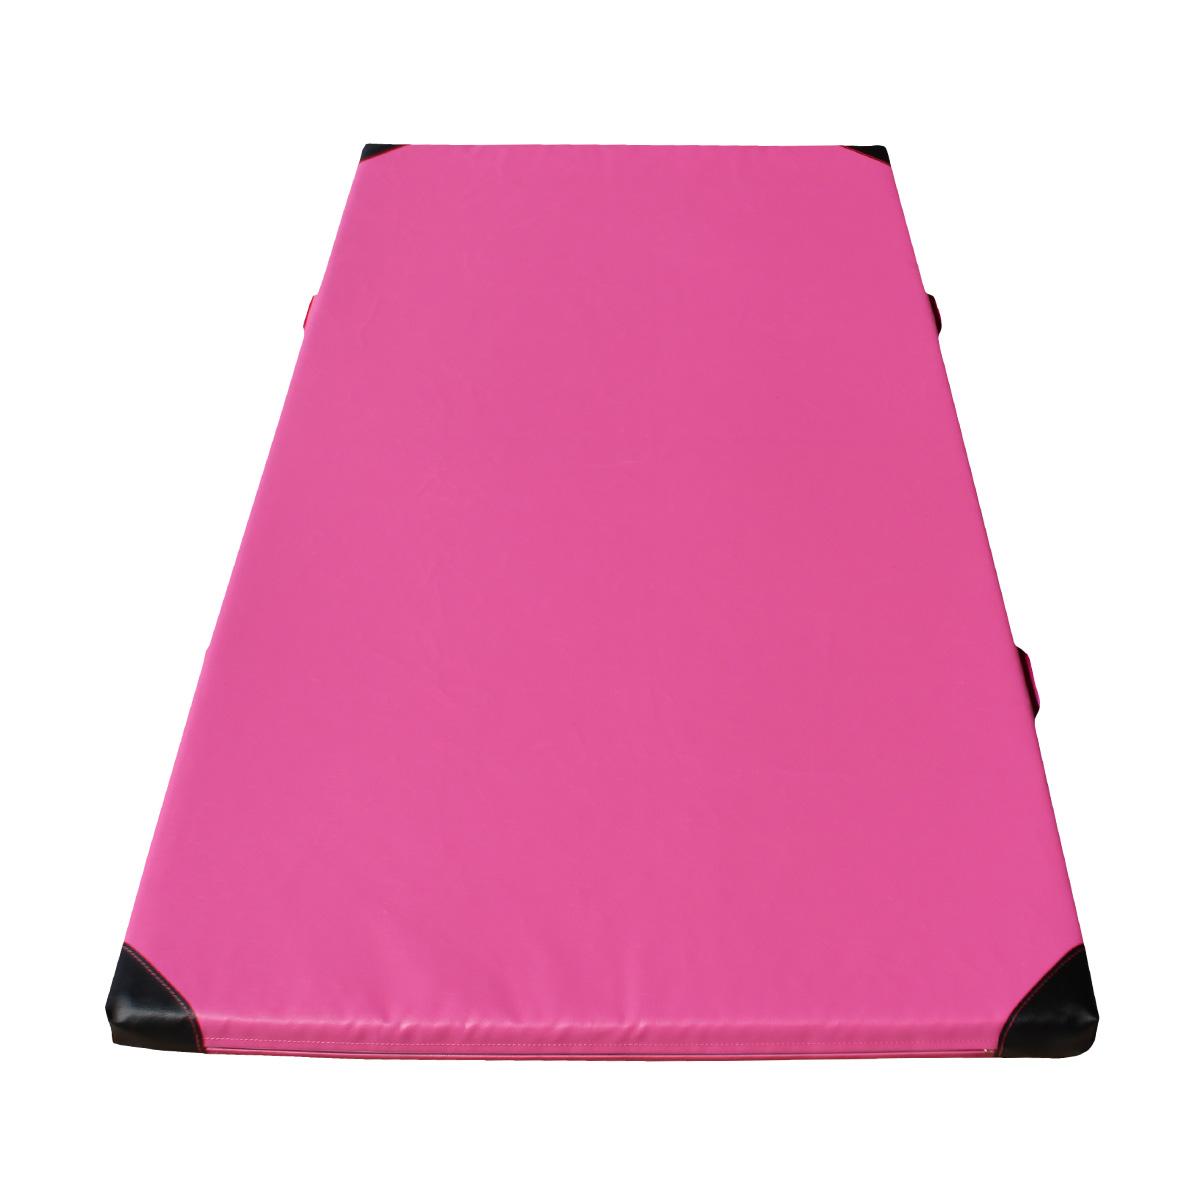 Žinenka MASTER Comfort Line R80 - 200 x 100 x 6 cm - ružová